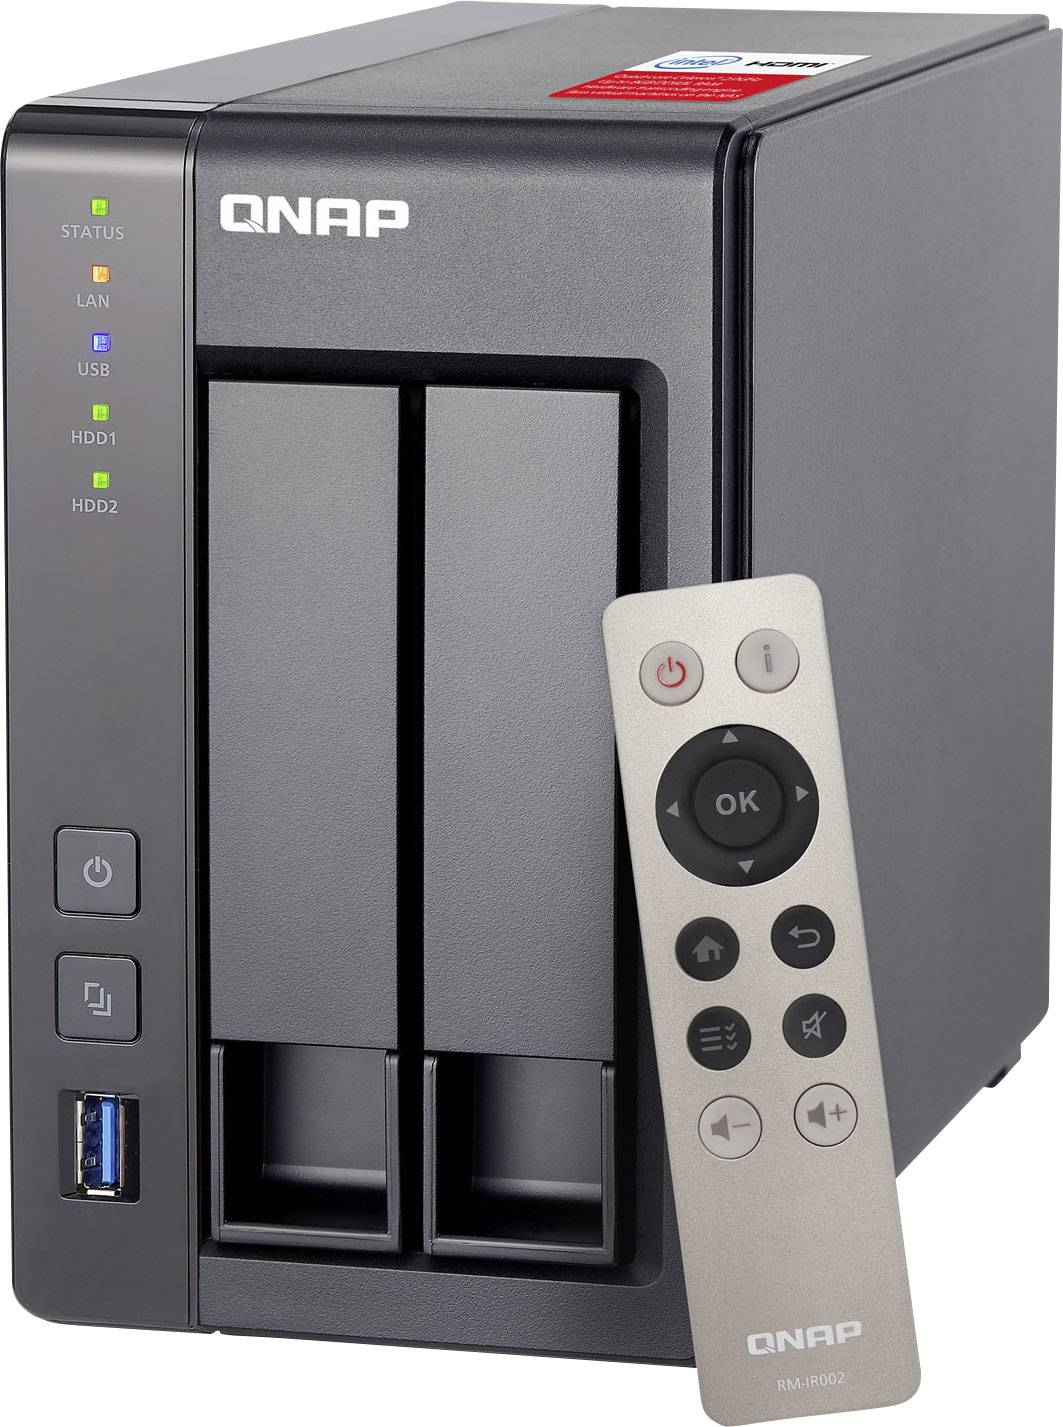 QNAP TS-251+-2G TS-251+-2G